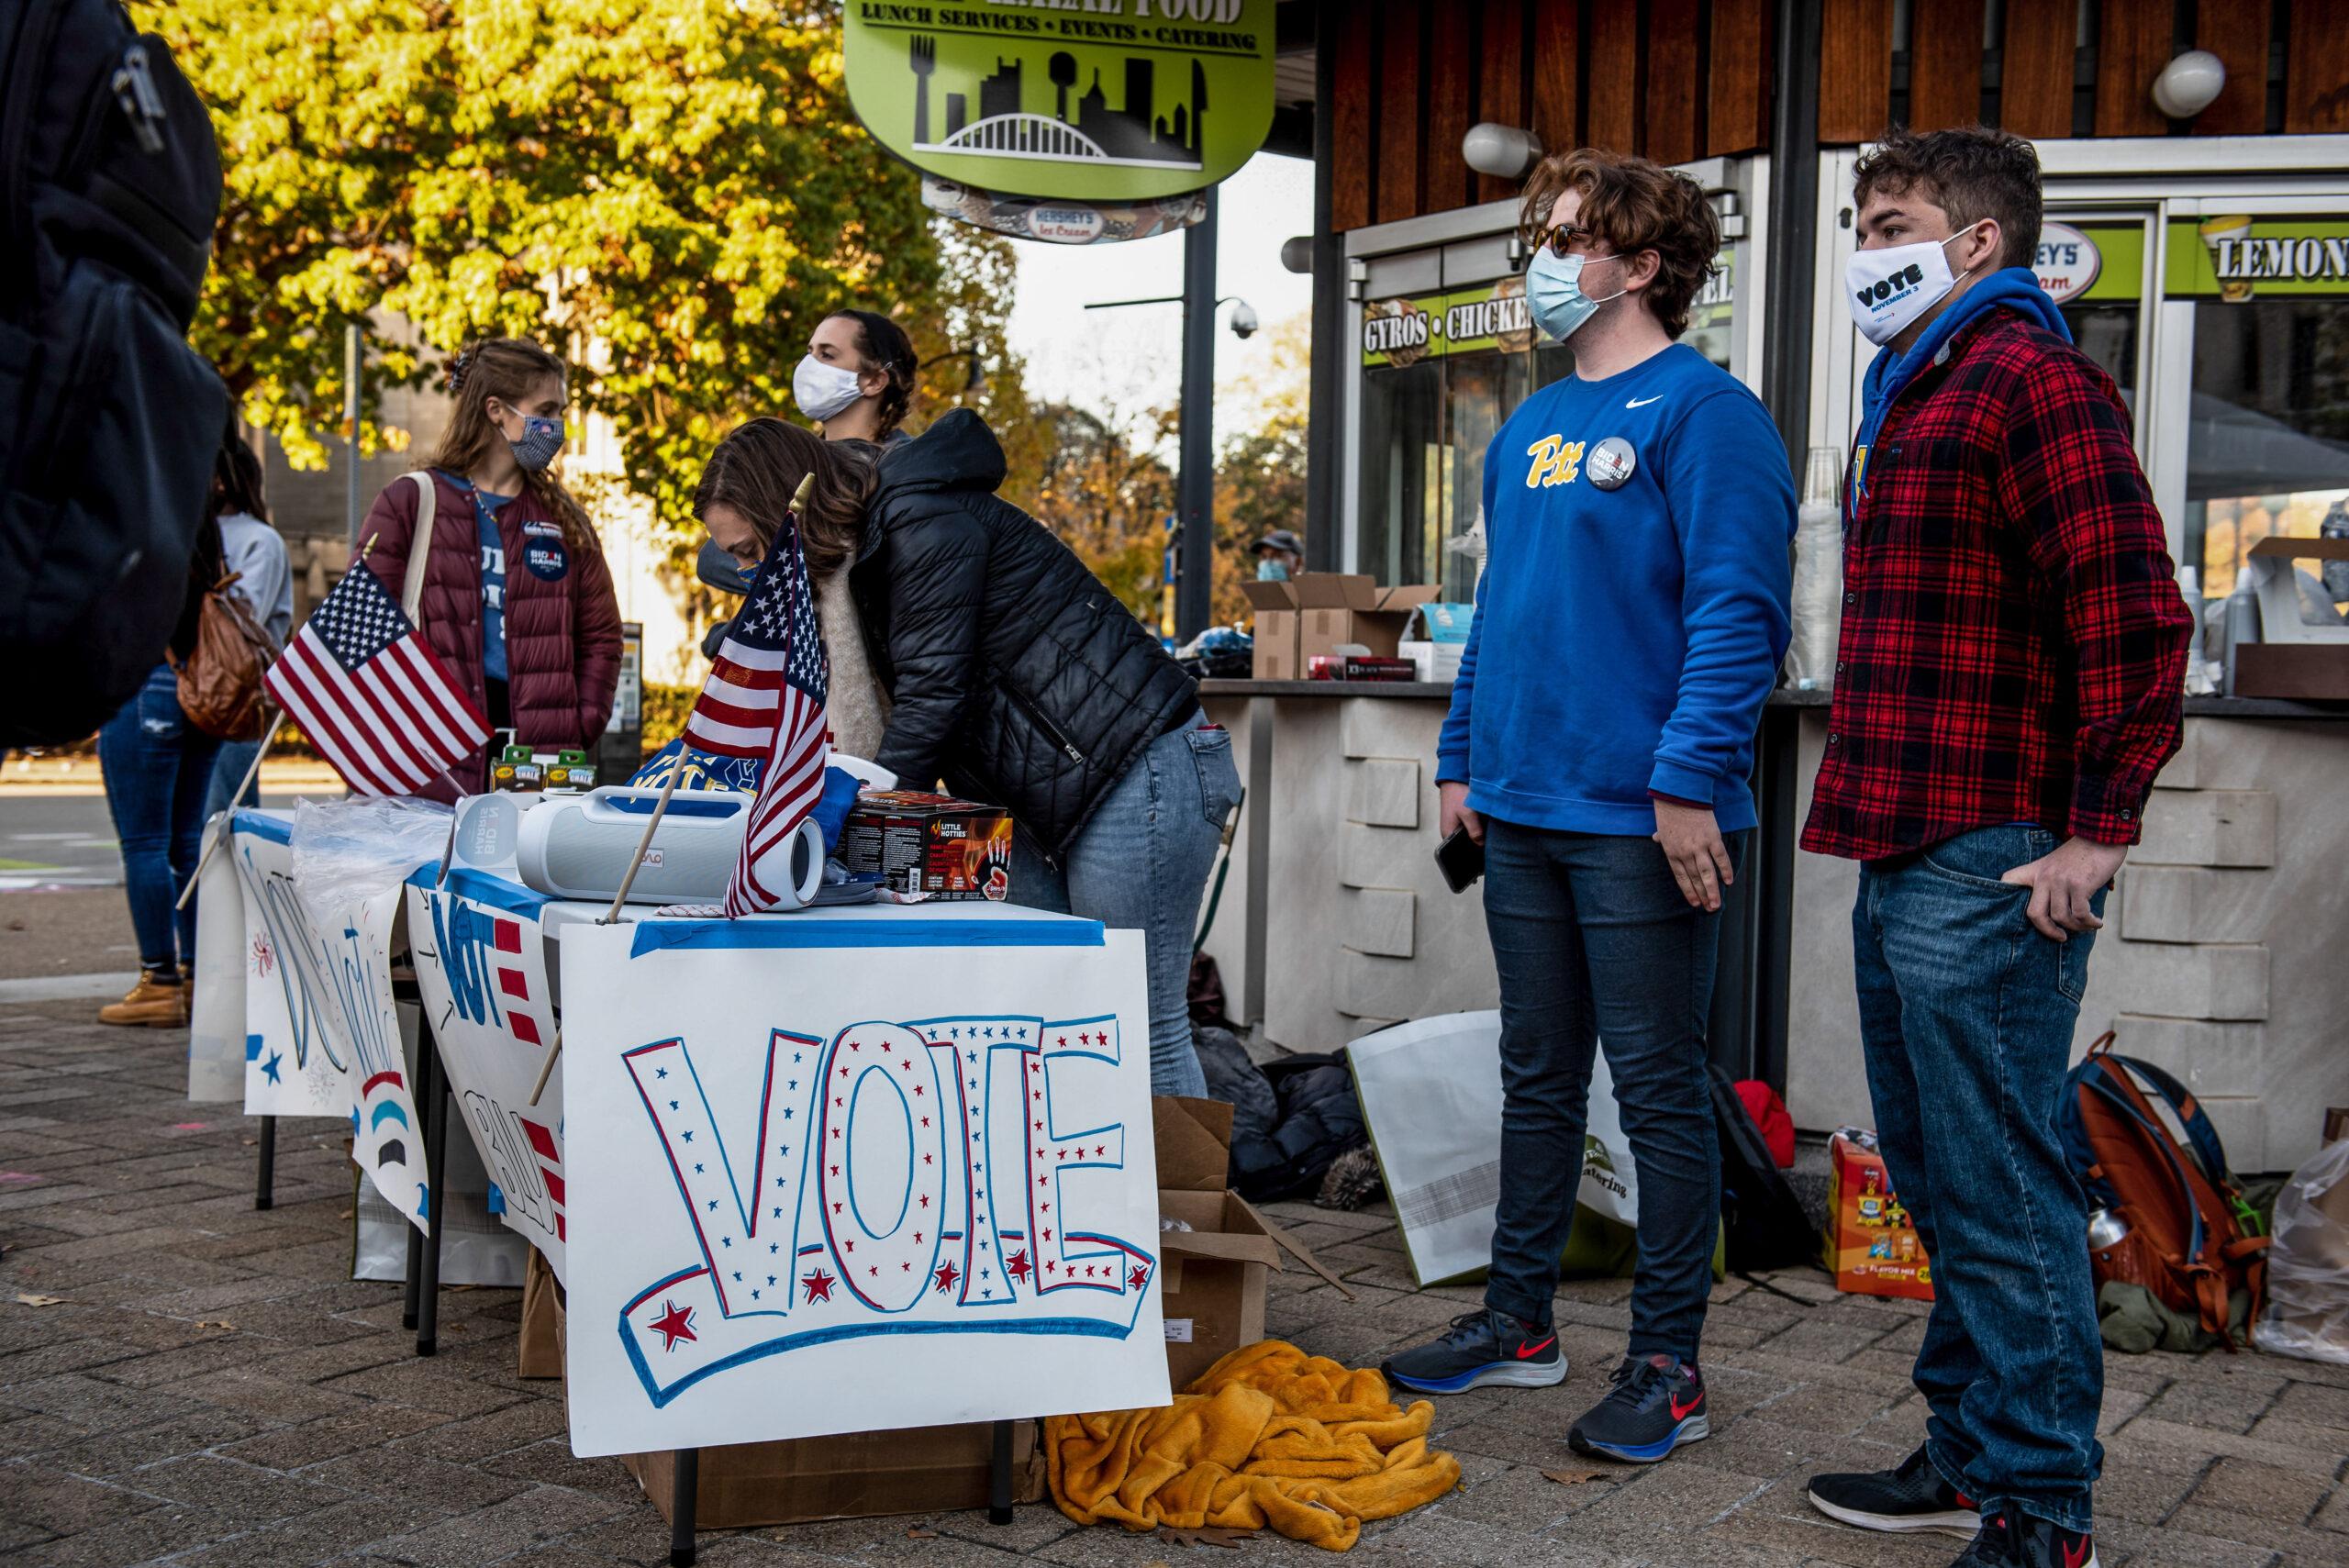 Civics education isn't boosting youth voting or volunteerism